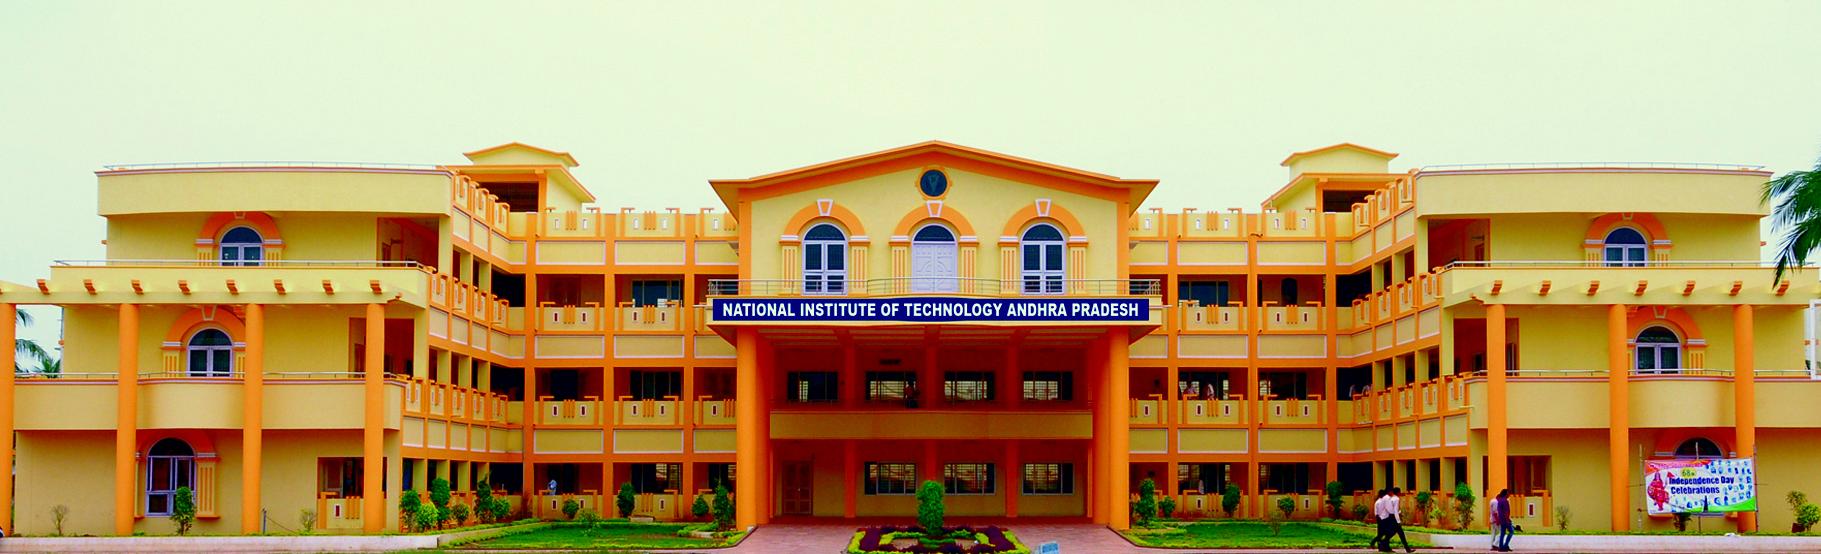 NIT (National Institute of Technology), Tadepalligudem Image